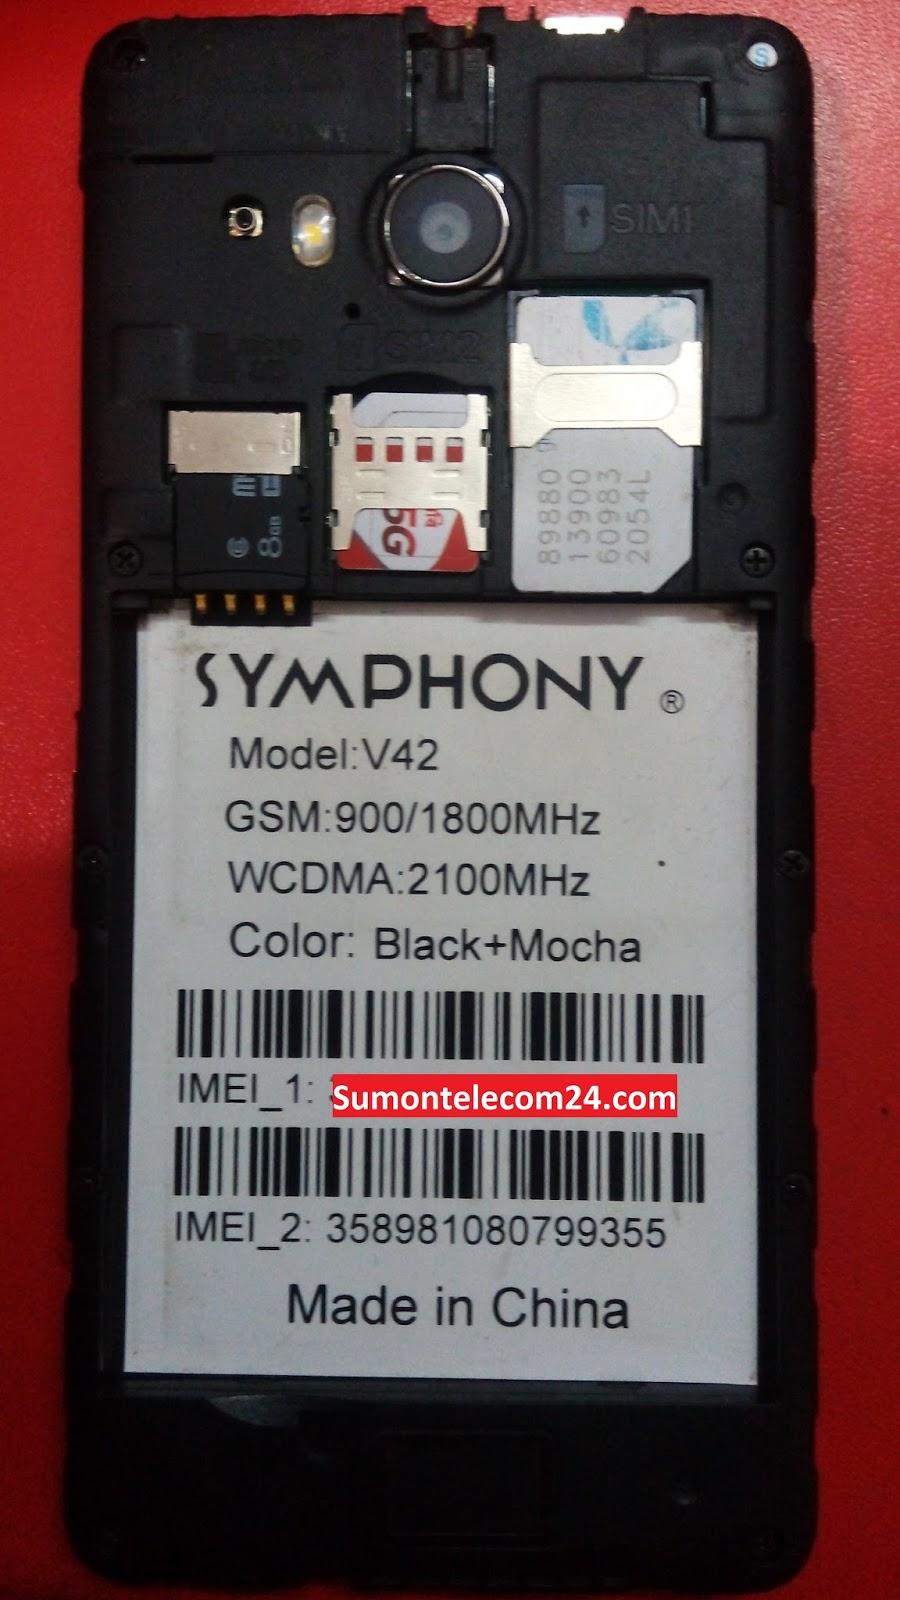 Symphony V42 Flash File (FRP Remove Flash File) Without